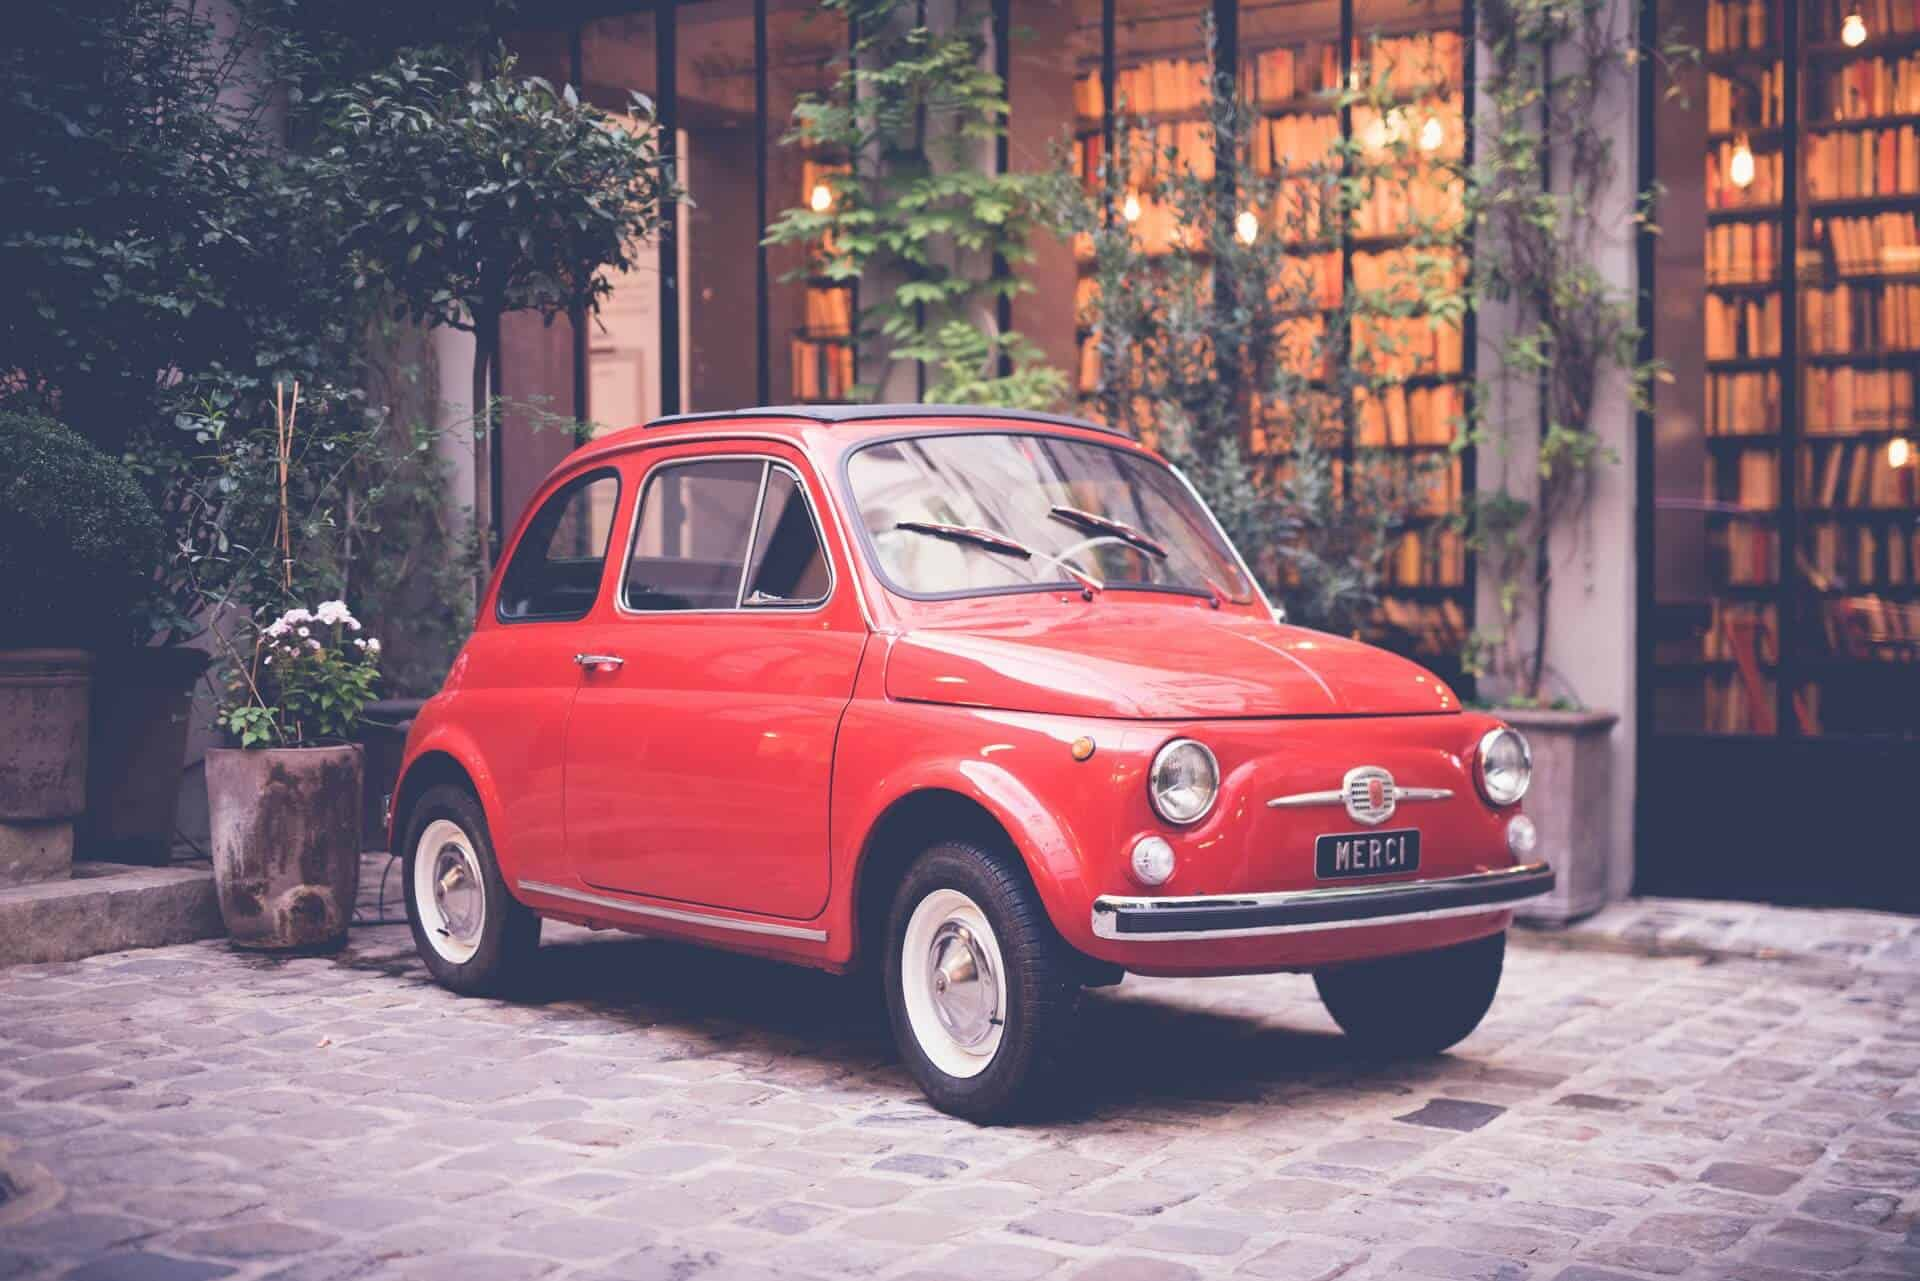 Restauro auto d'epoca Cuneo